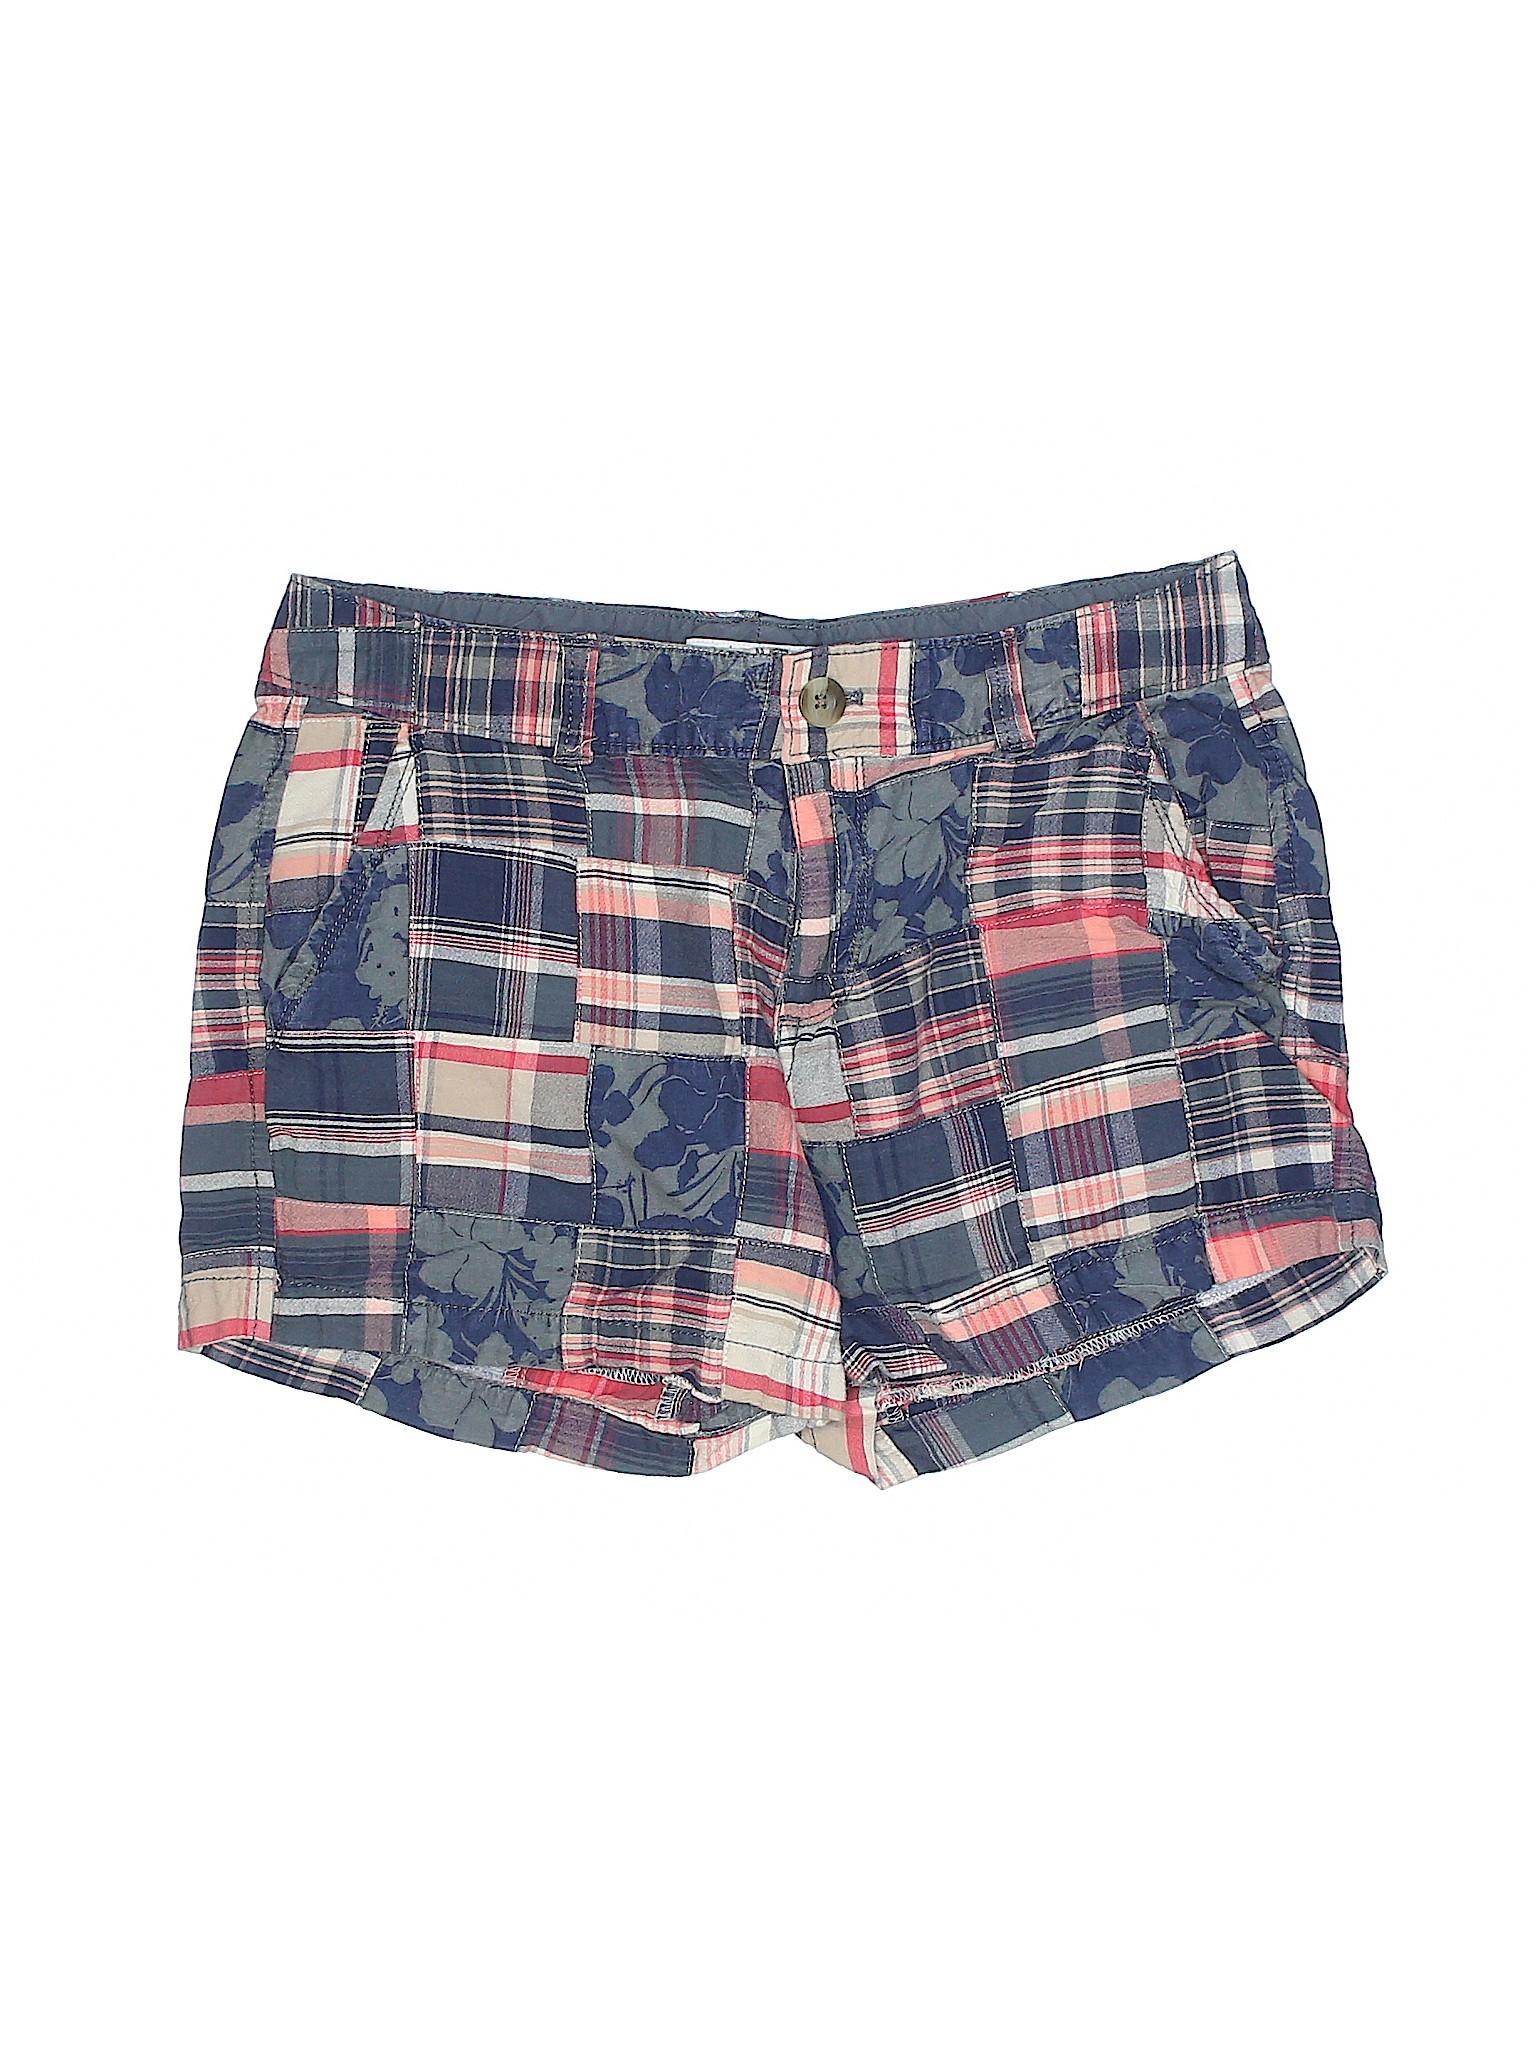 Shorts Old Boutique Khaki Boutique Navy Navy Old Khaki xUw0vWRRn